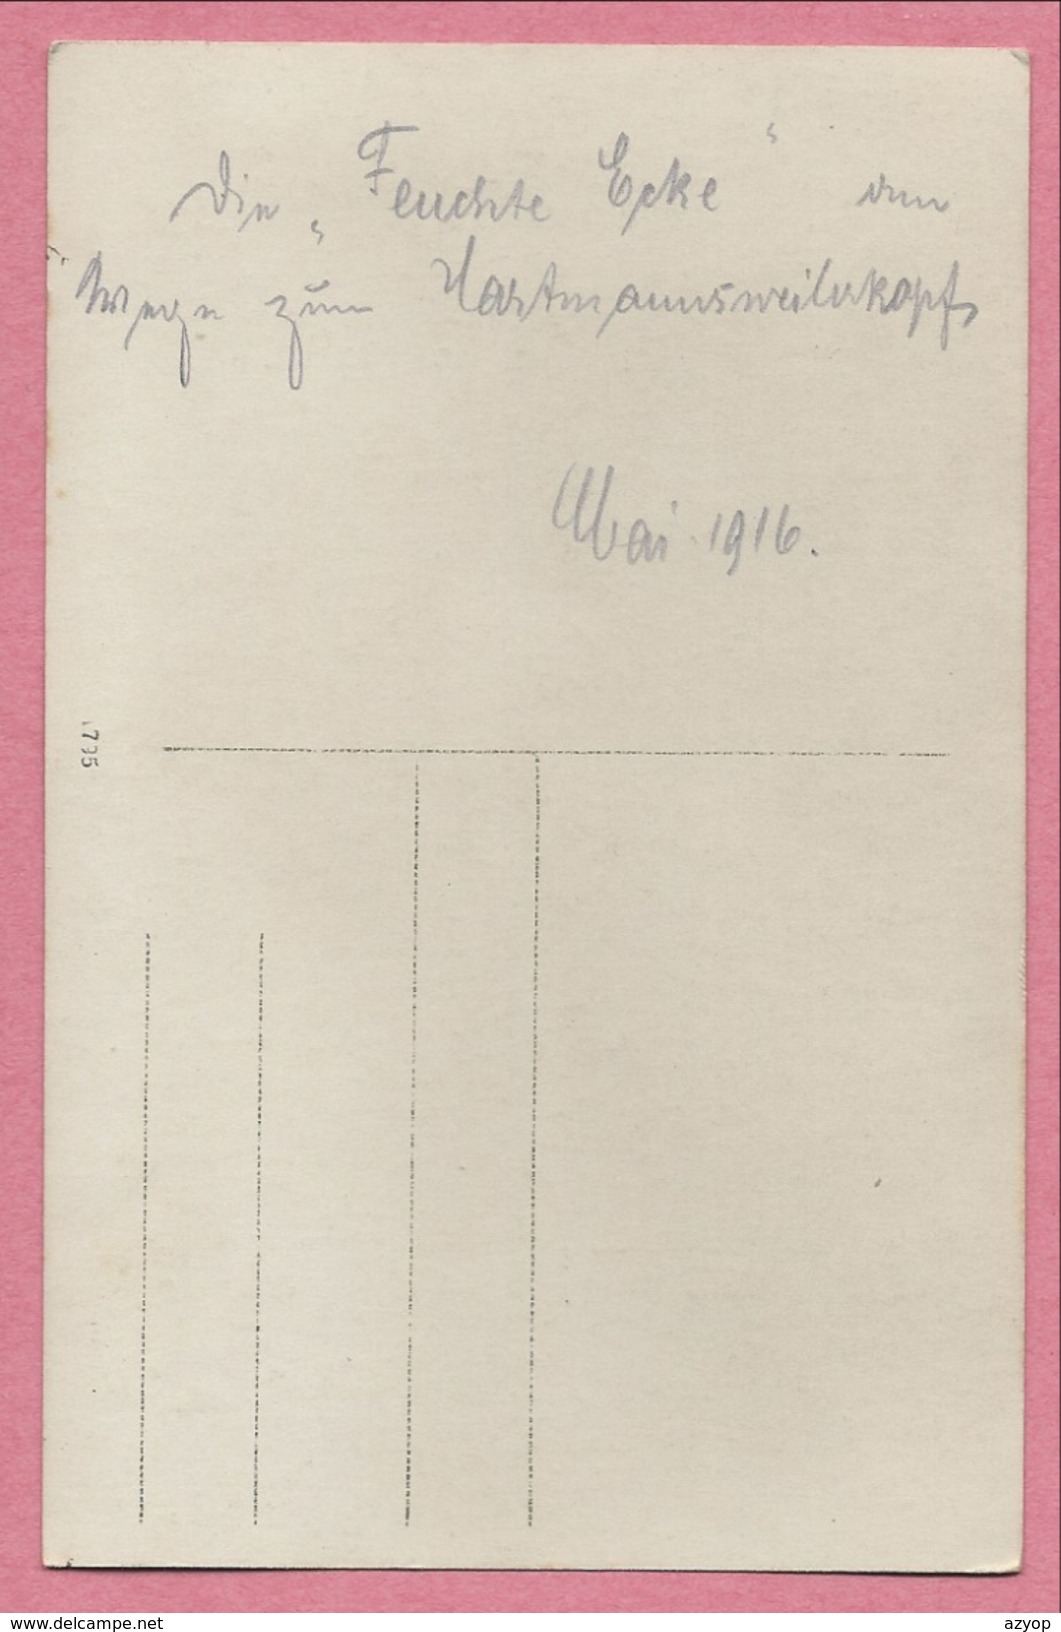 "68 - HARTMANNSWEILERKOPF - VIEIL ARMAND - Carte Photo Allemande - Soldats Allemands - "" Feuchte Ecke "" - Guerre 14/18 - Frankrijk"